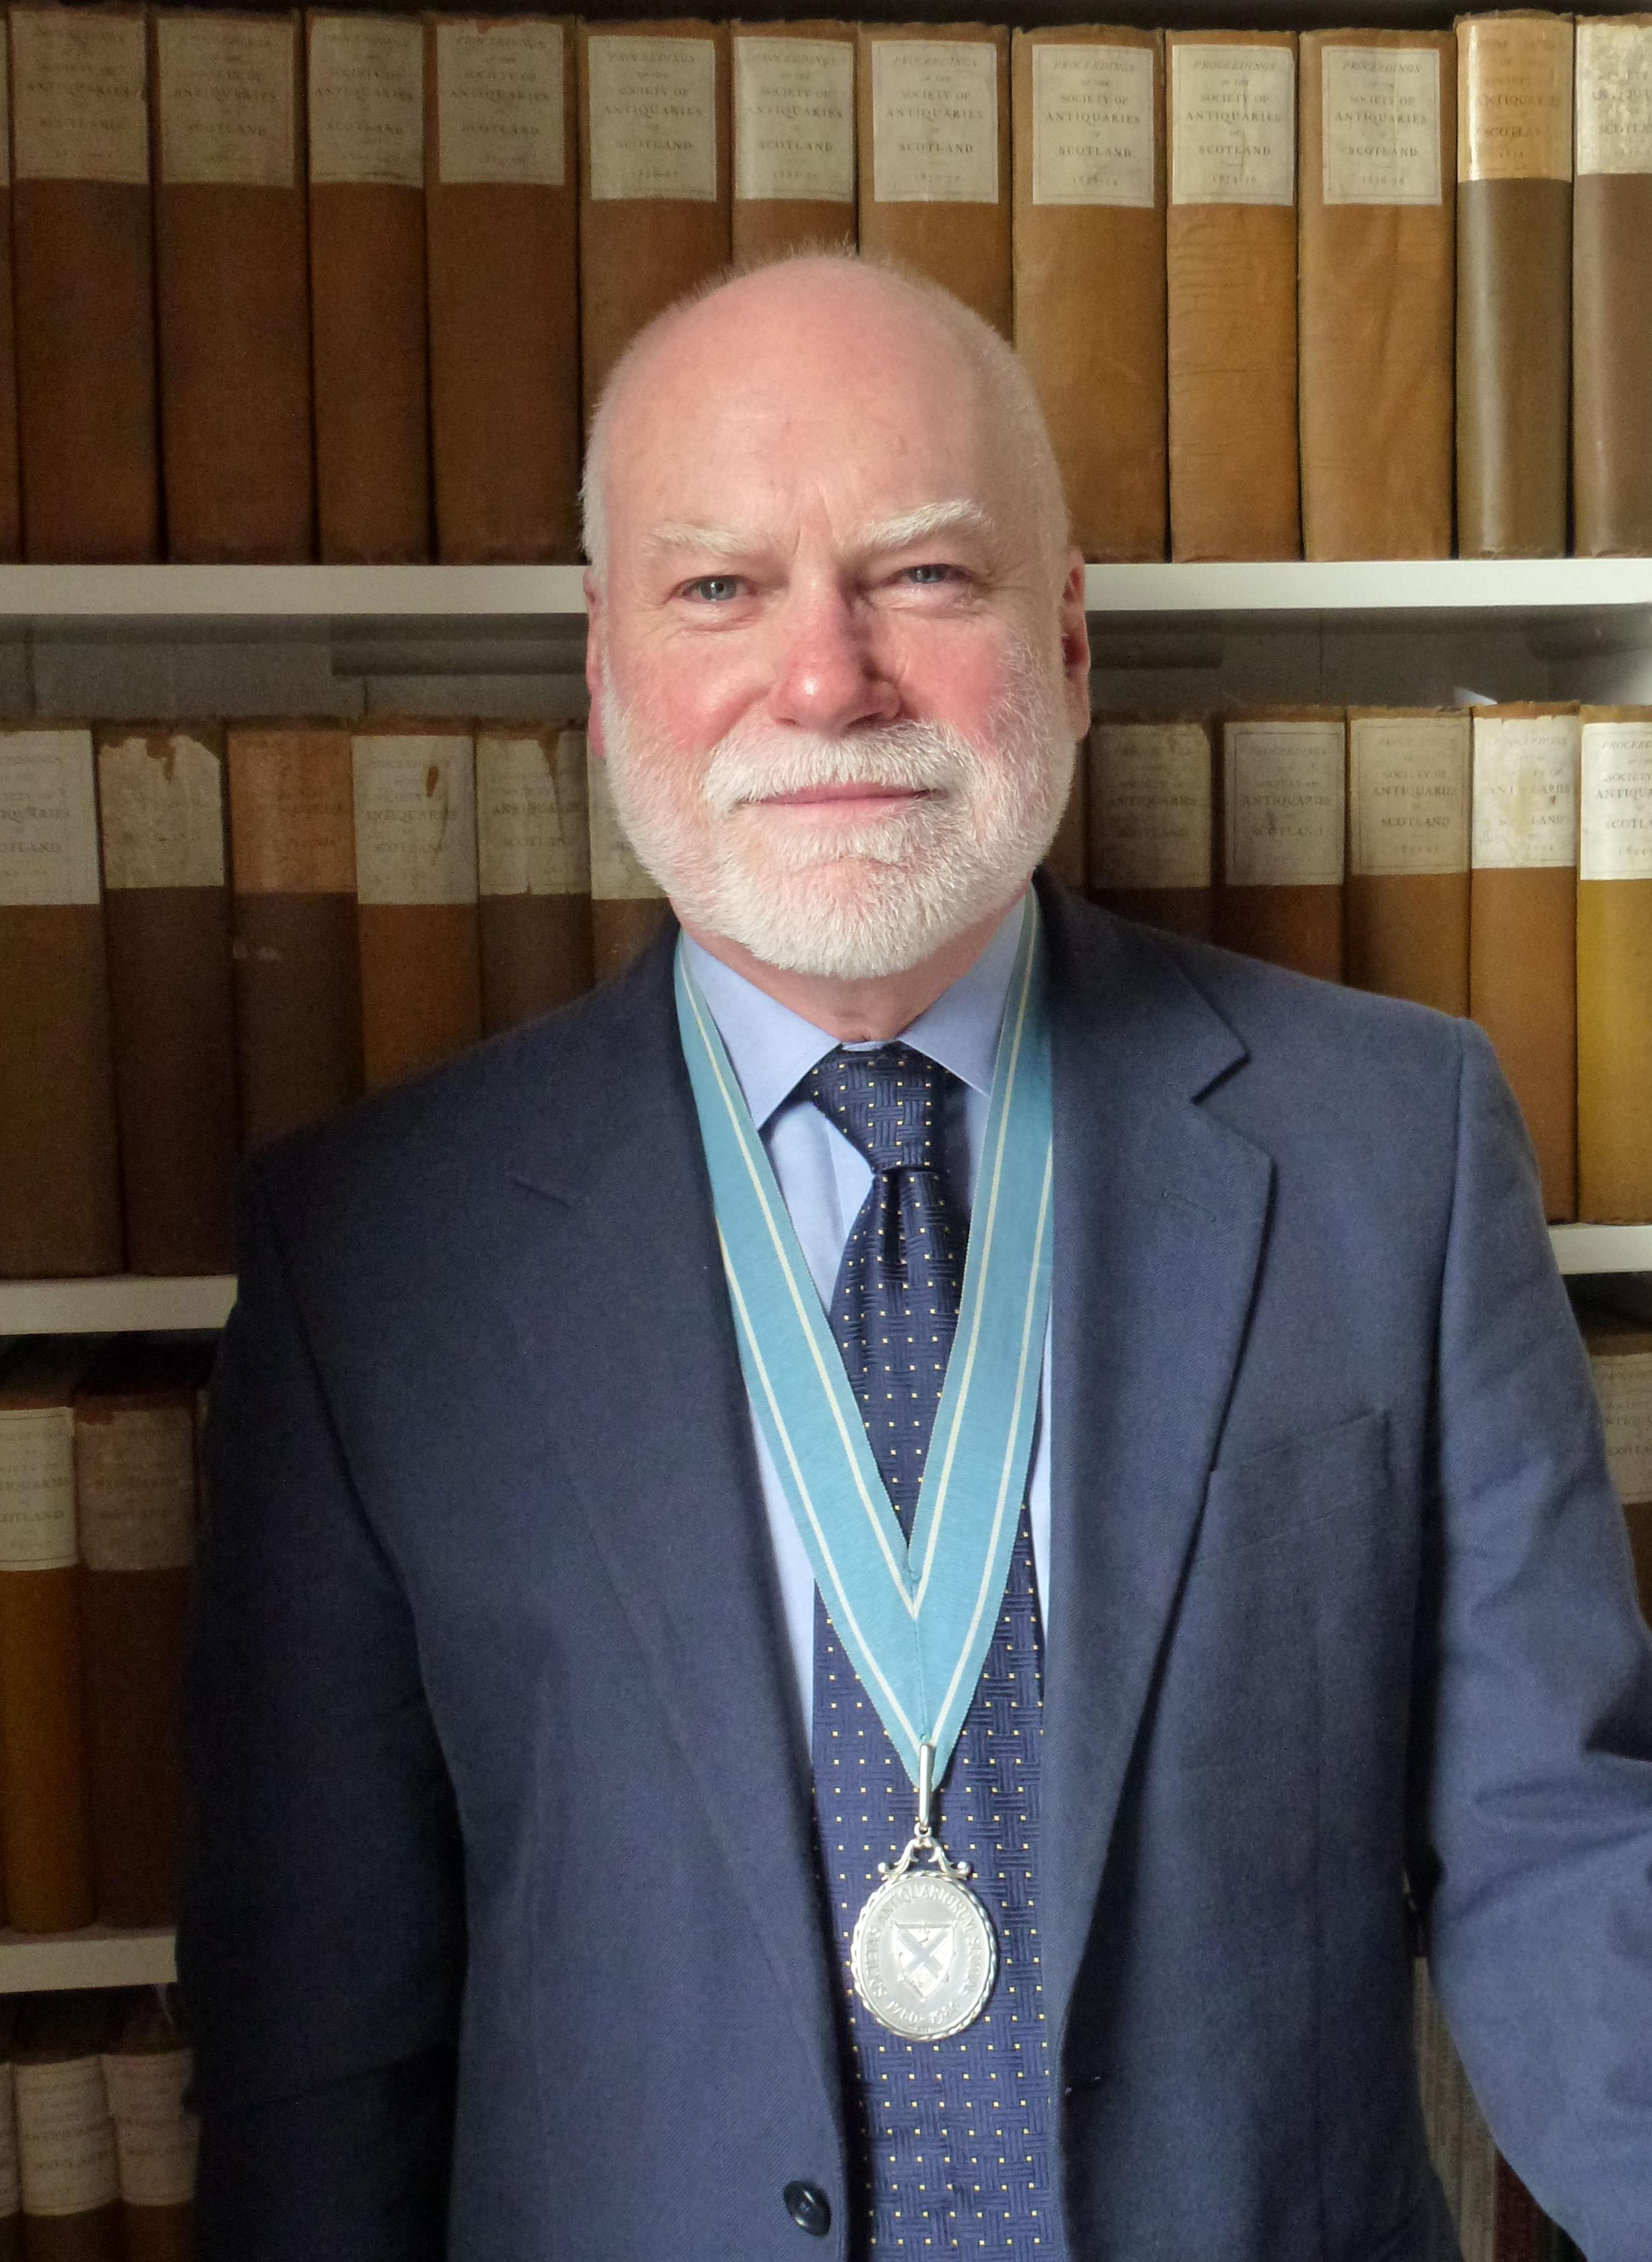 Alan Saville, Past President of the Society